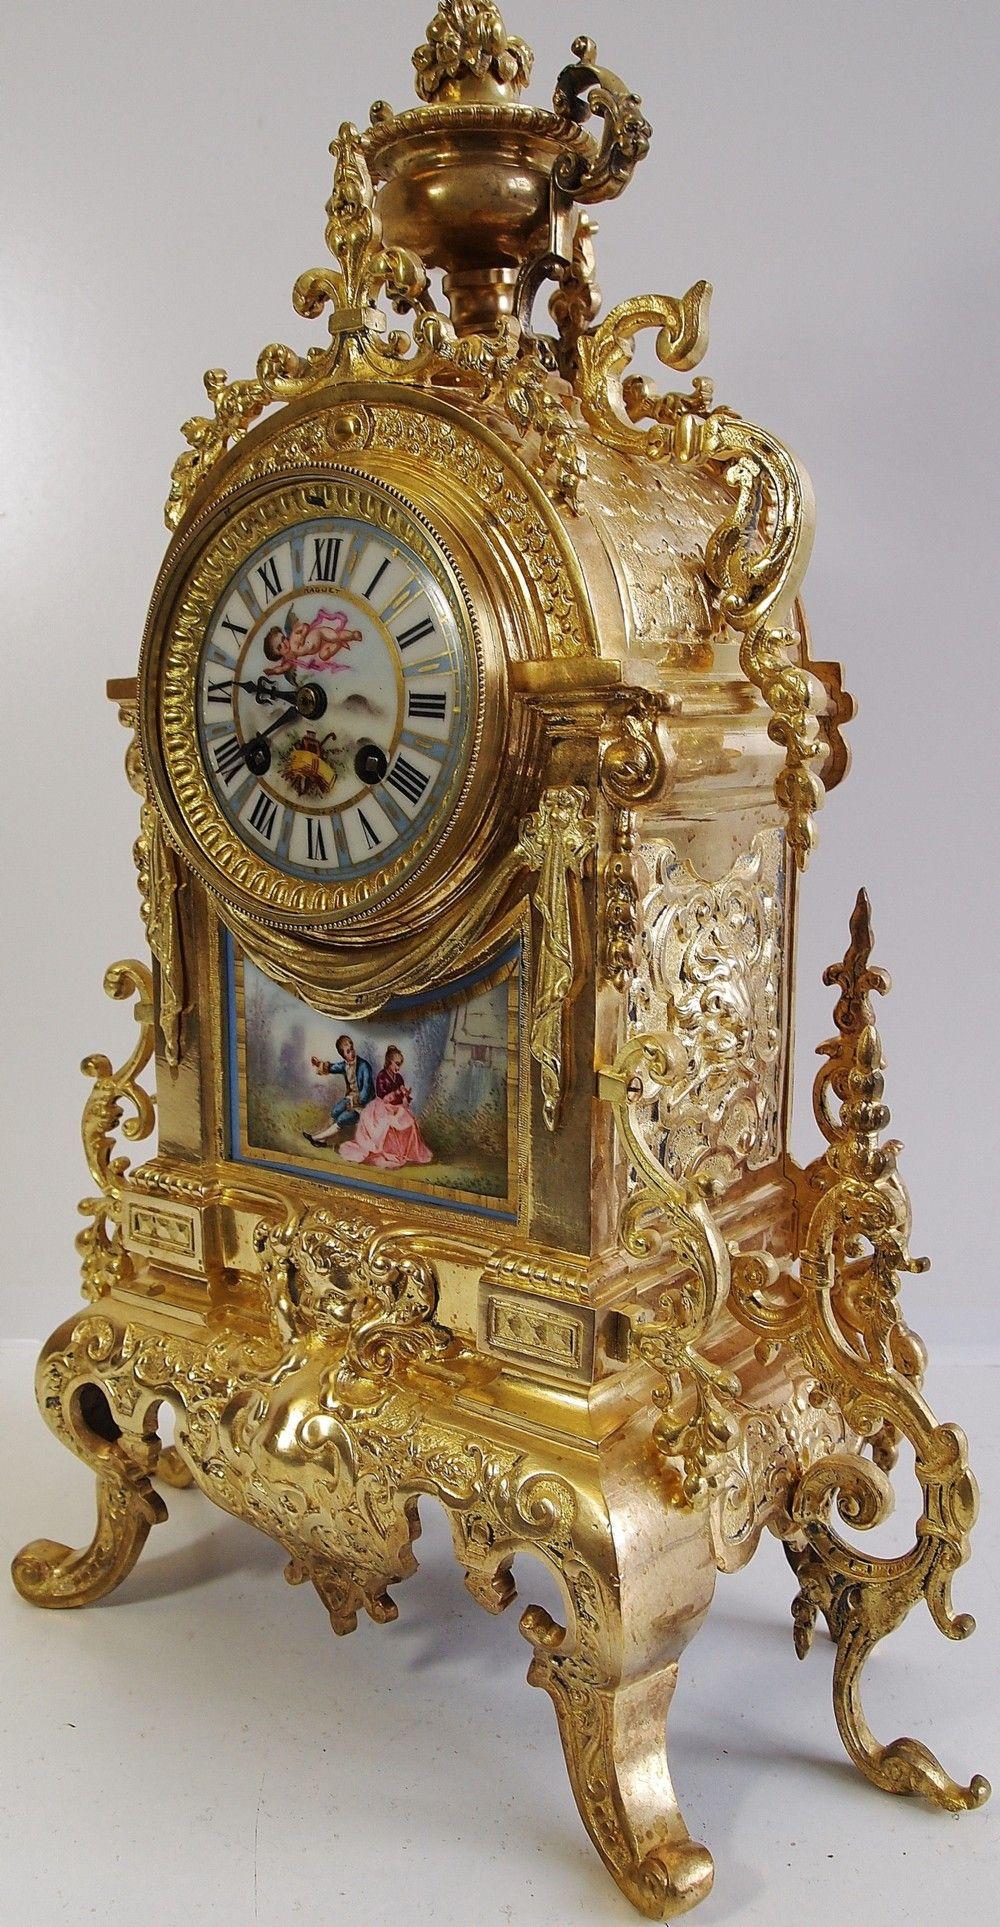 03a50d098cda Relojes antiguos 19o C francesa Admougin bronce y porcelana de Sèvres Manto  del reloj .